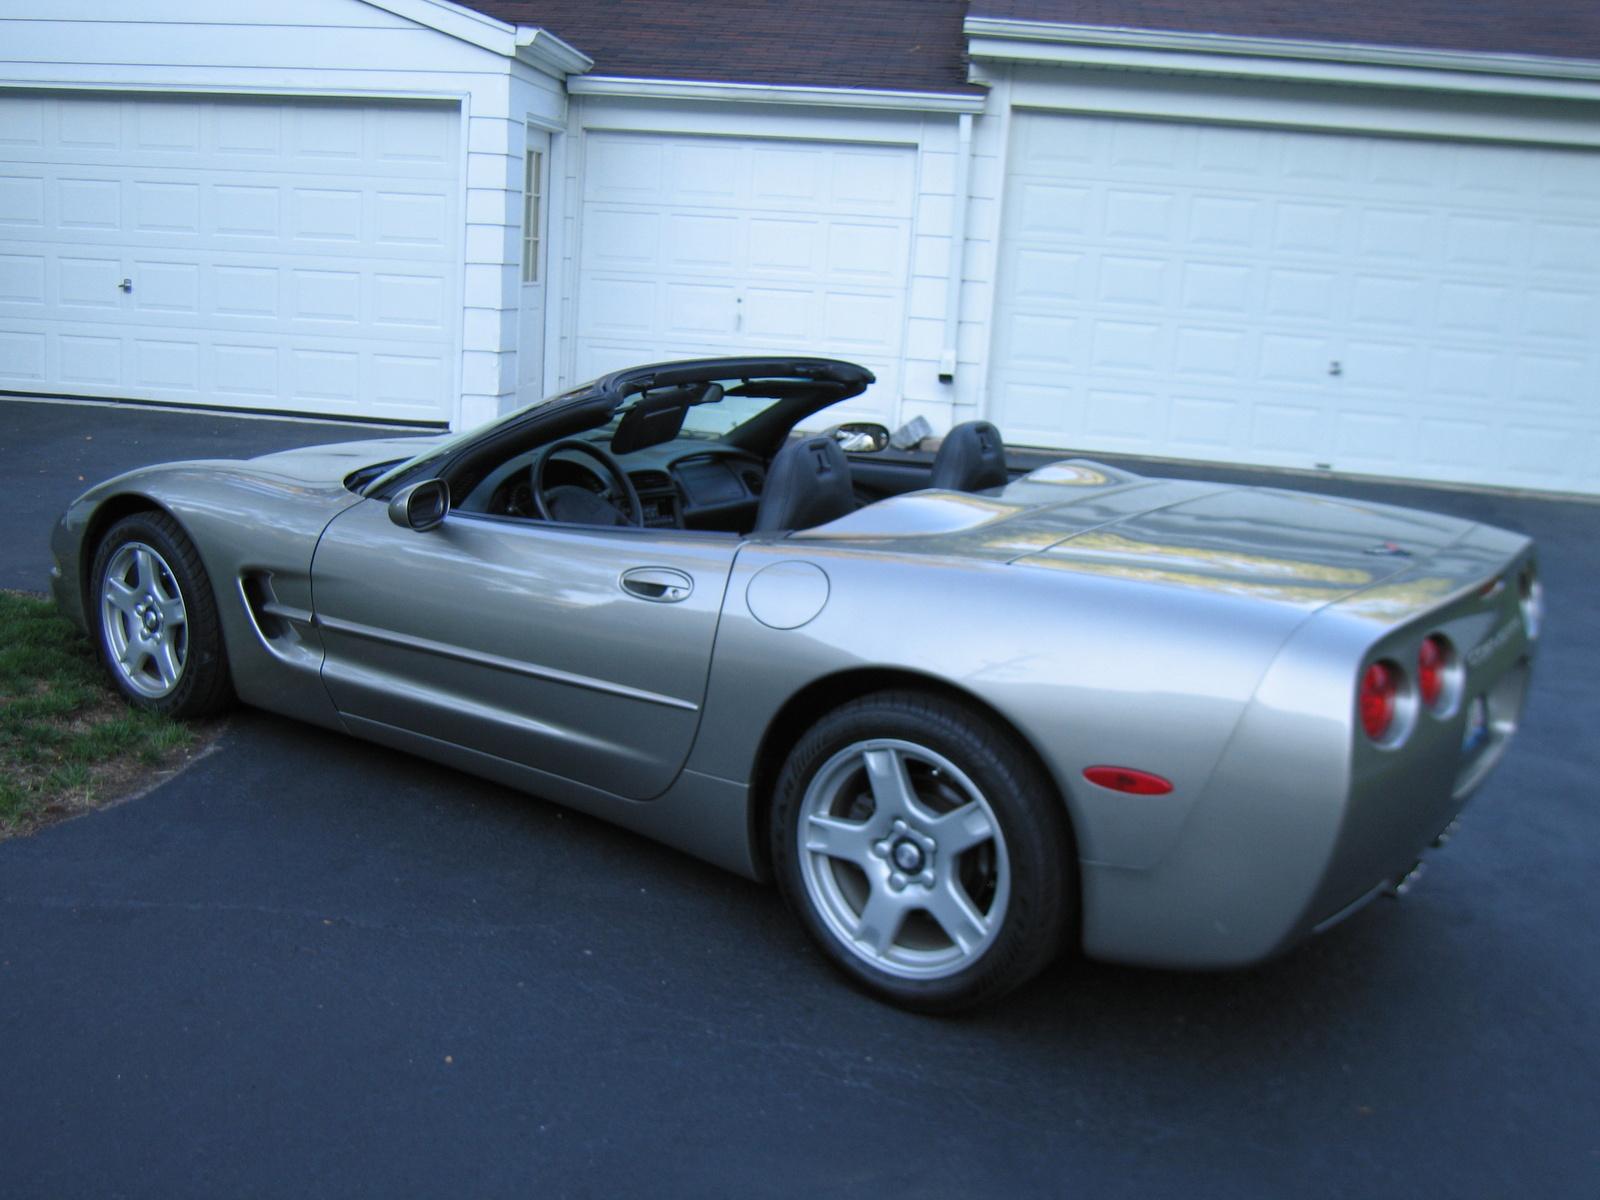 1997 chevrolet corvette for sale in chicago il cargurus. Black Bedroom Furniture Sets. Home Design Ideas